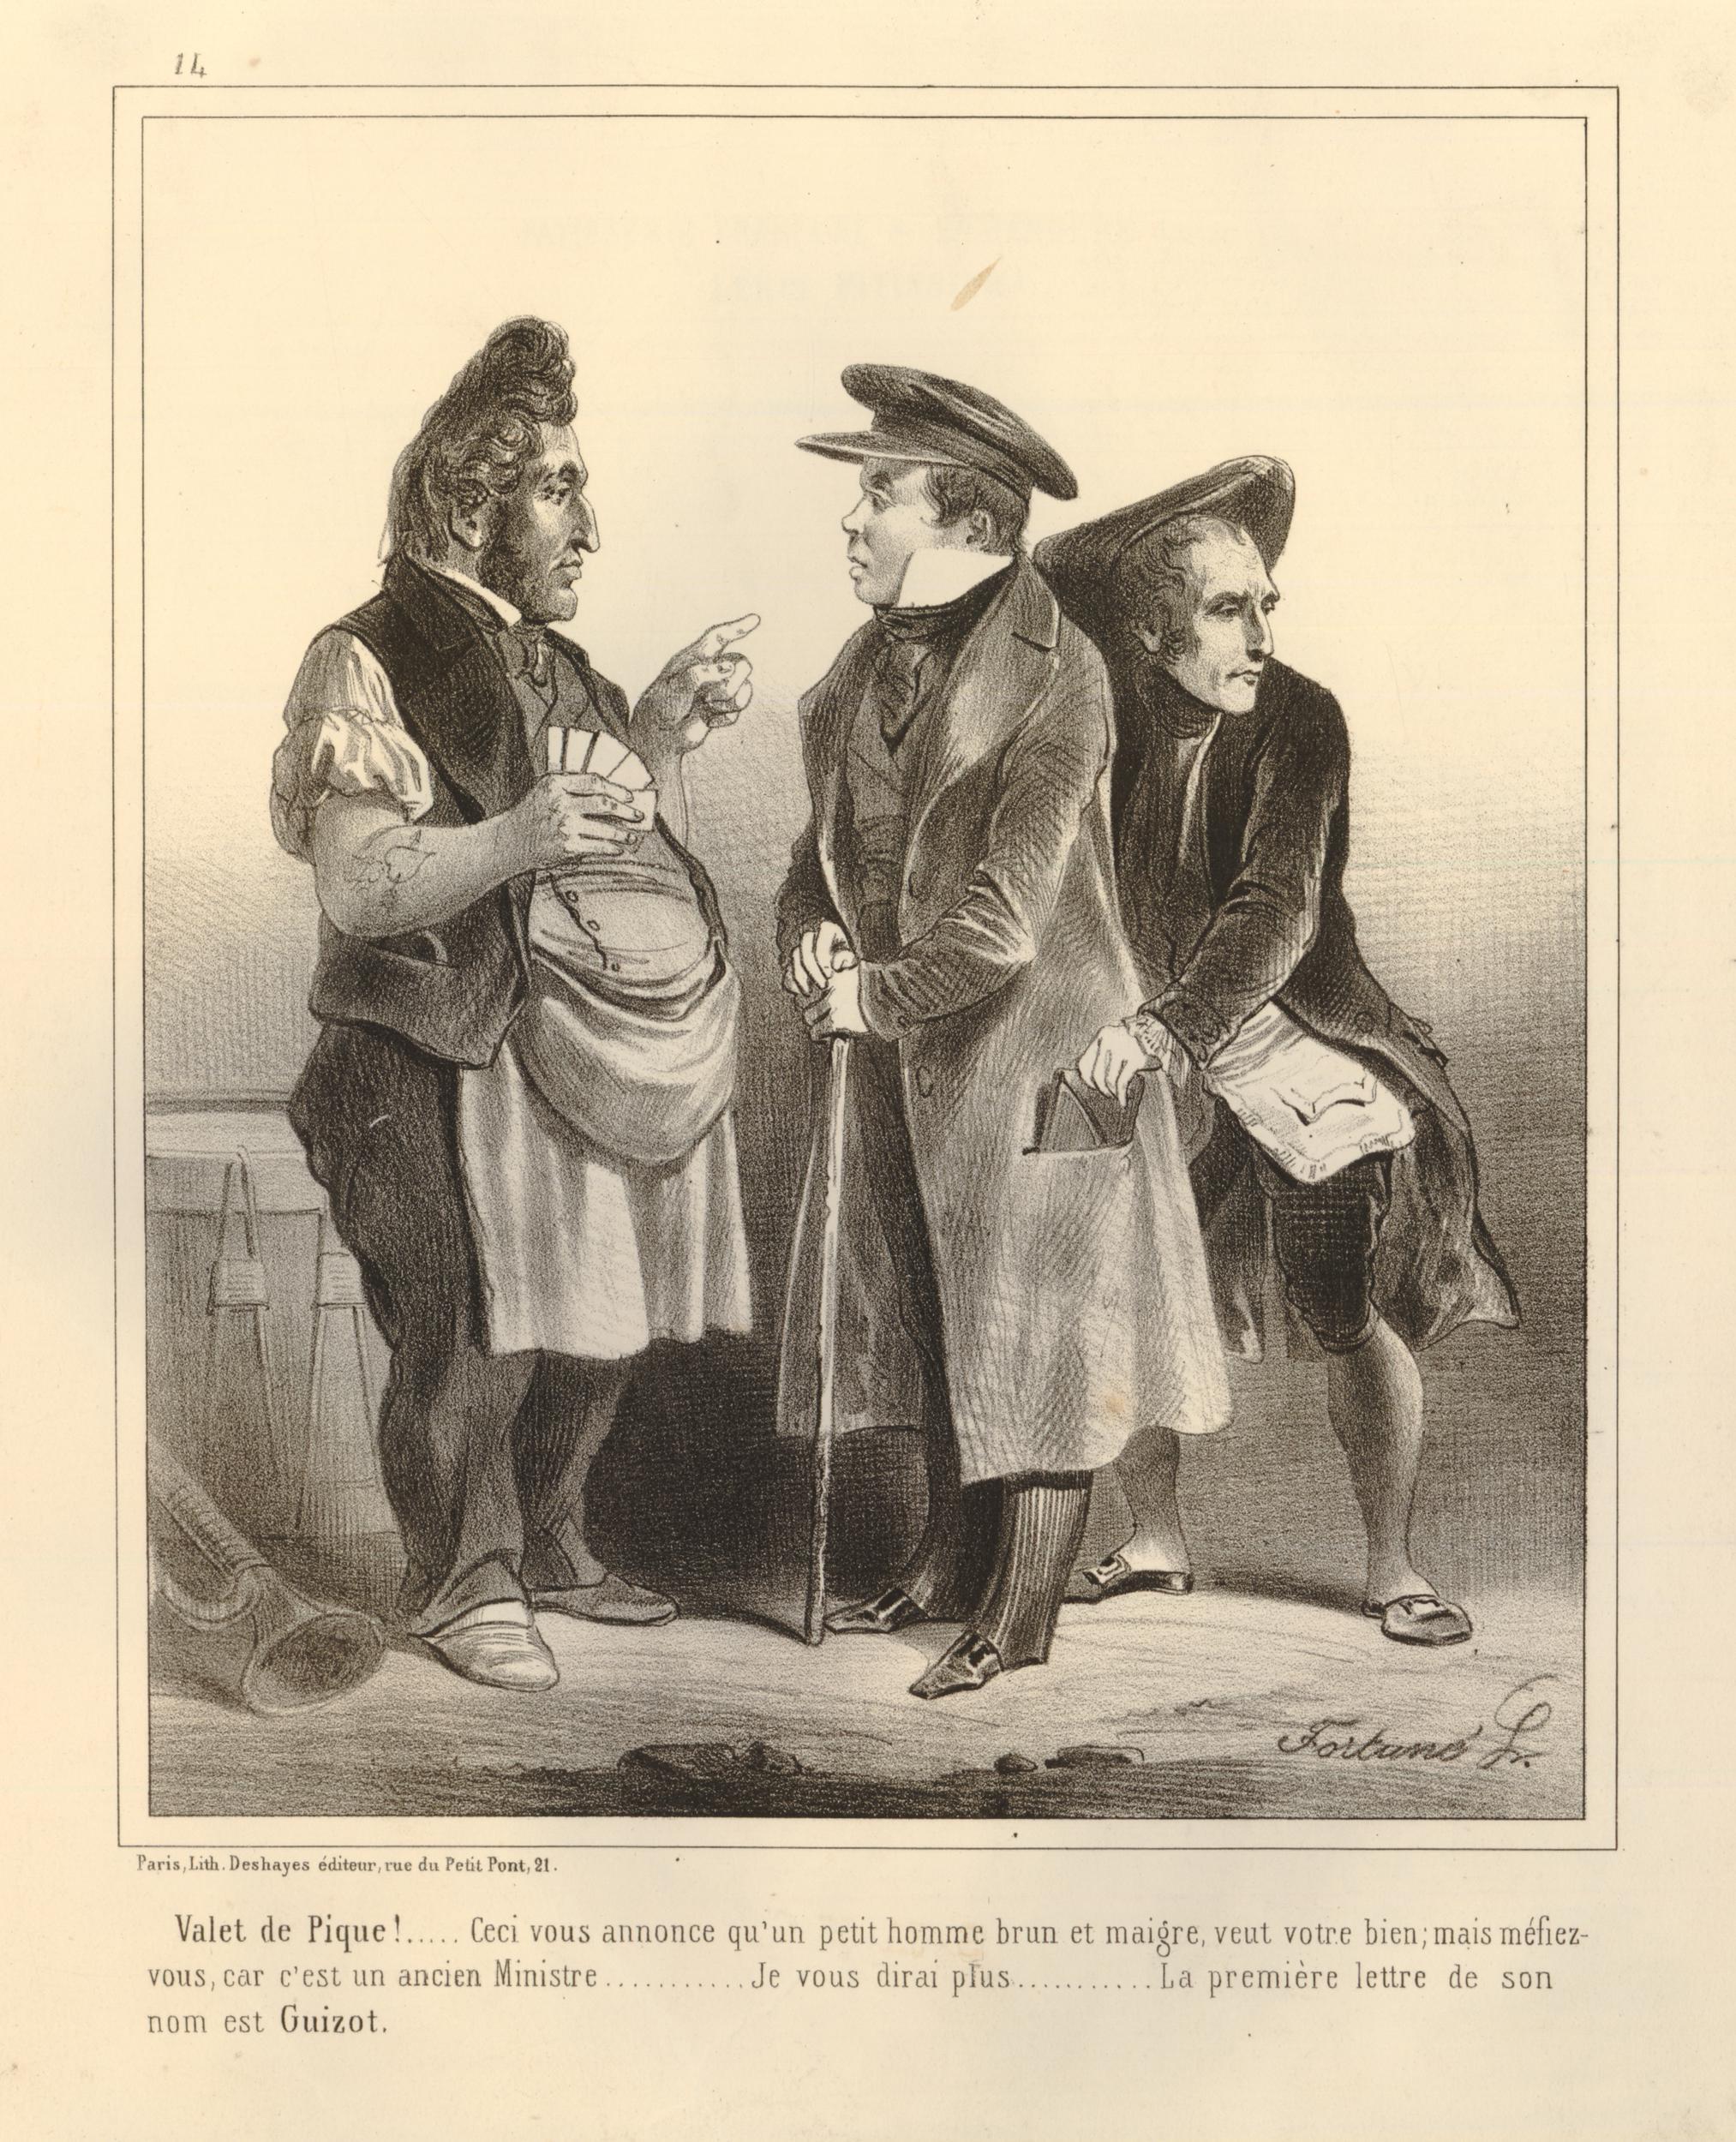 Nom Du Valet De Pique : valet, pique, File:Print,, Satirical, Print, 1940,0810.21.30).jpg, Wikimedia, Commons